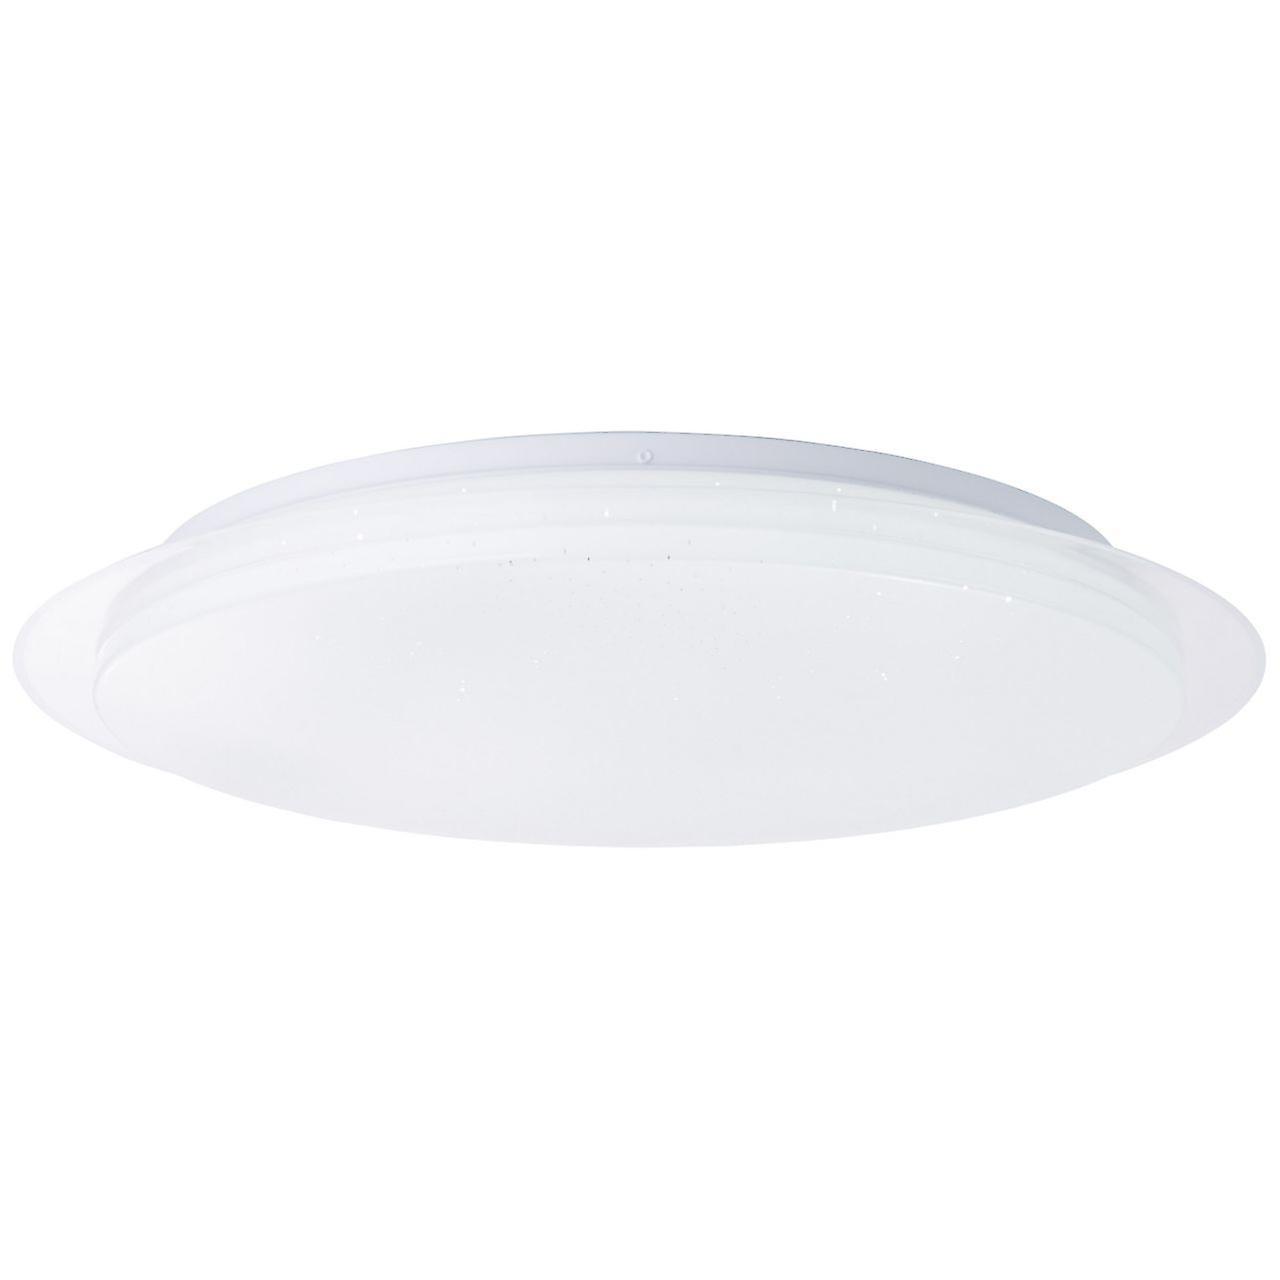 Brelight Lampe Vittoria LED Wand- und Deckenleuchte 57cm weiß | 1x 60W LED integriert, (4390lm, 3000-6000K) | Skala A++ bis E | Inklusive Fernbedienung